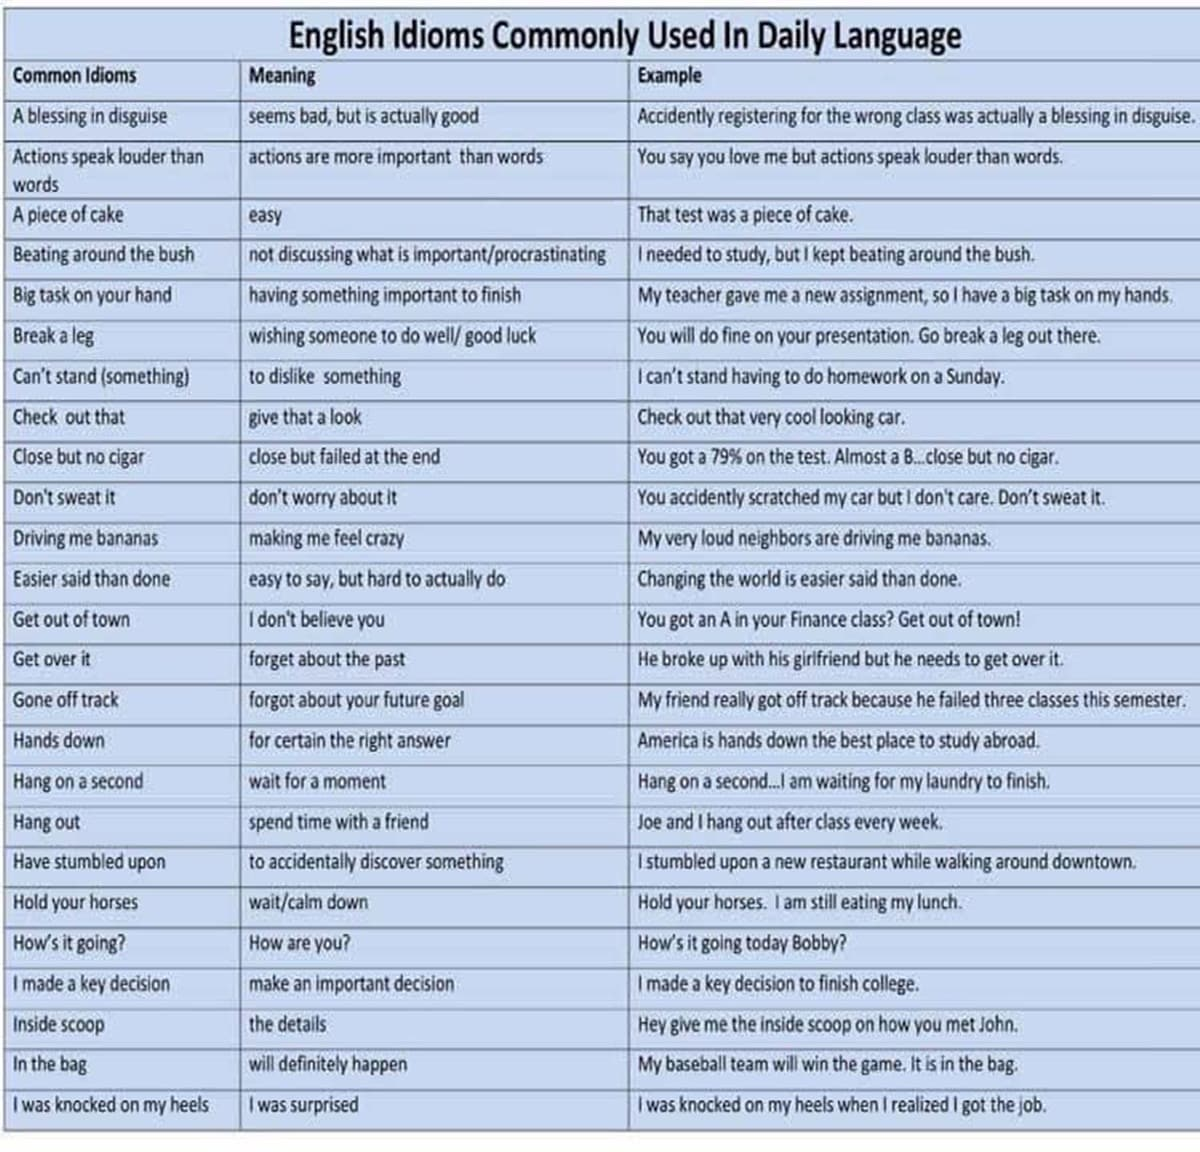 10 Popular English Idioms to Sound Like a Native 14